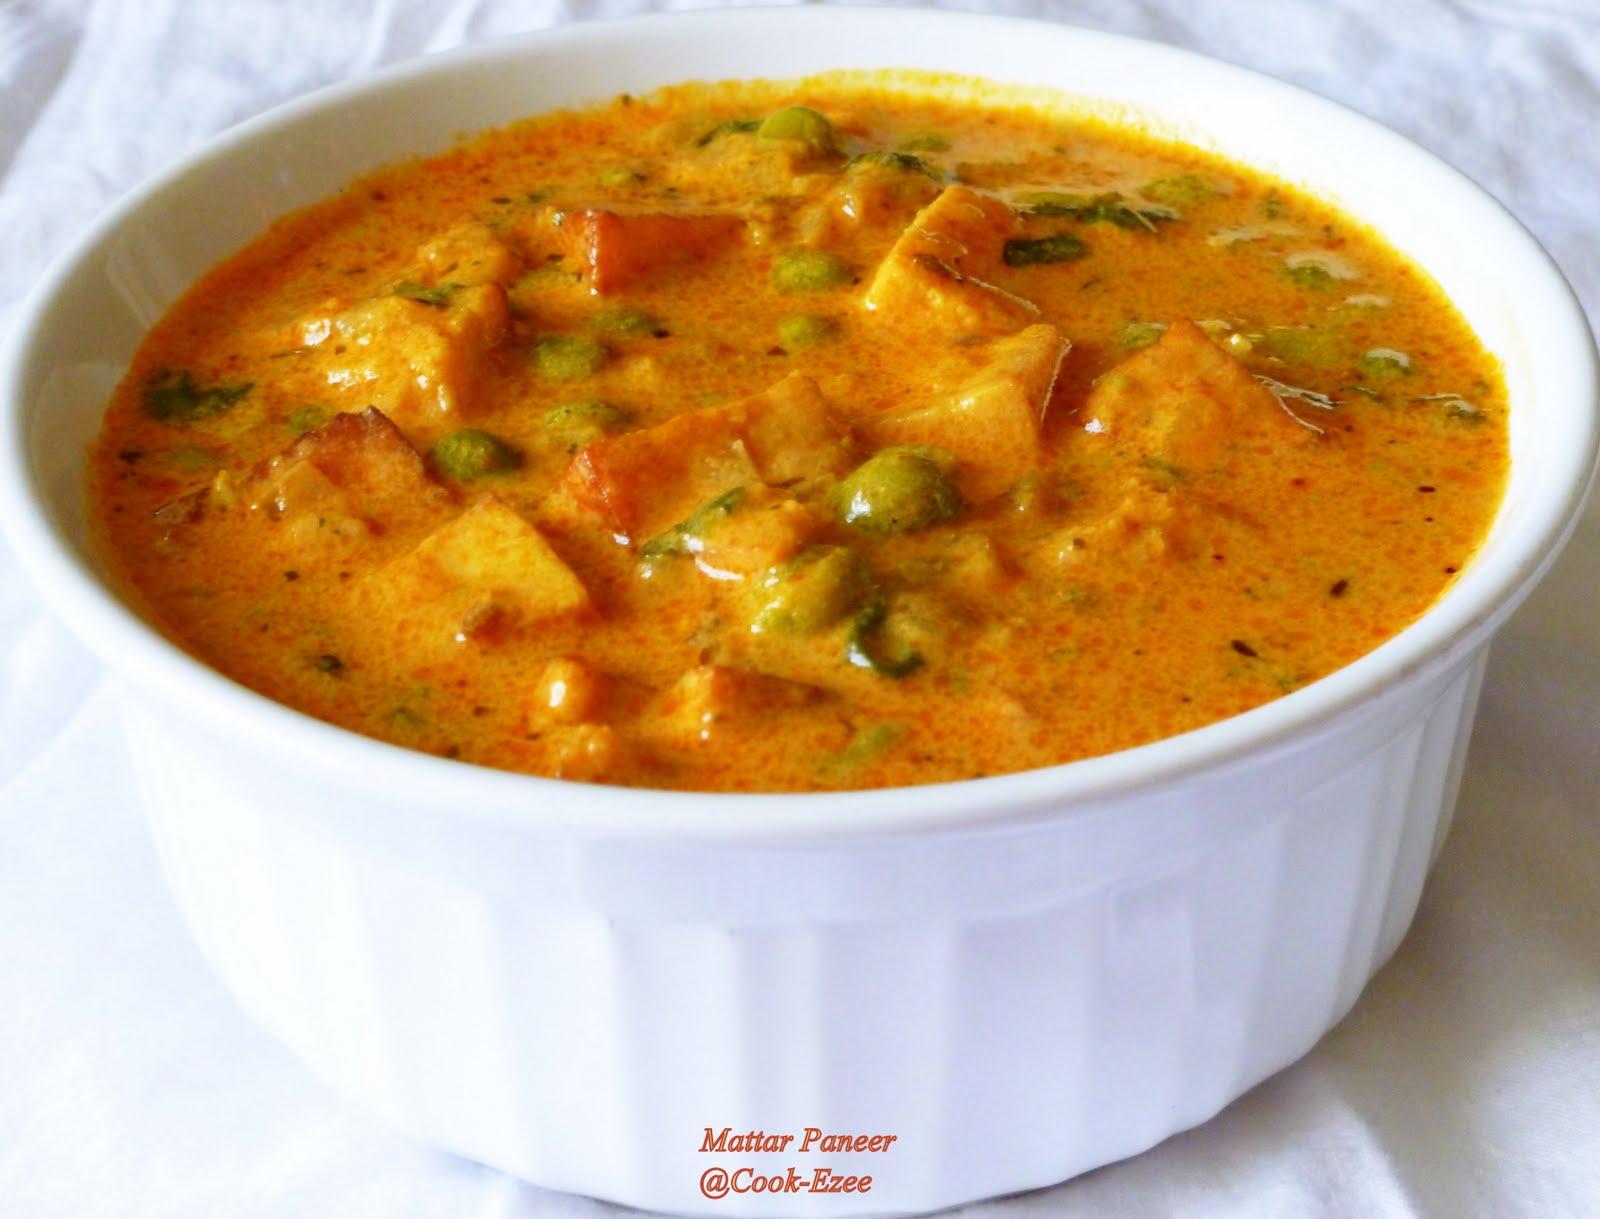 Cook Ezee Mattar Paneer Masala Green Peas Cottage Cheese